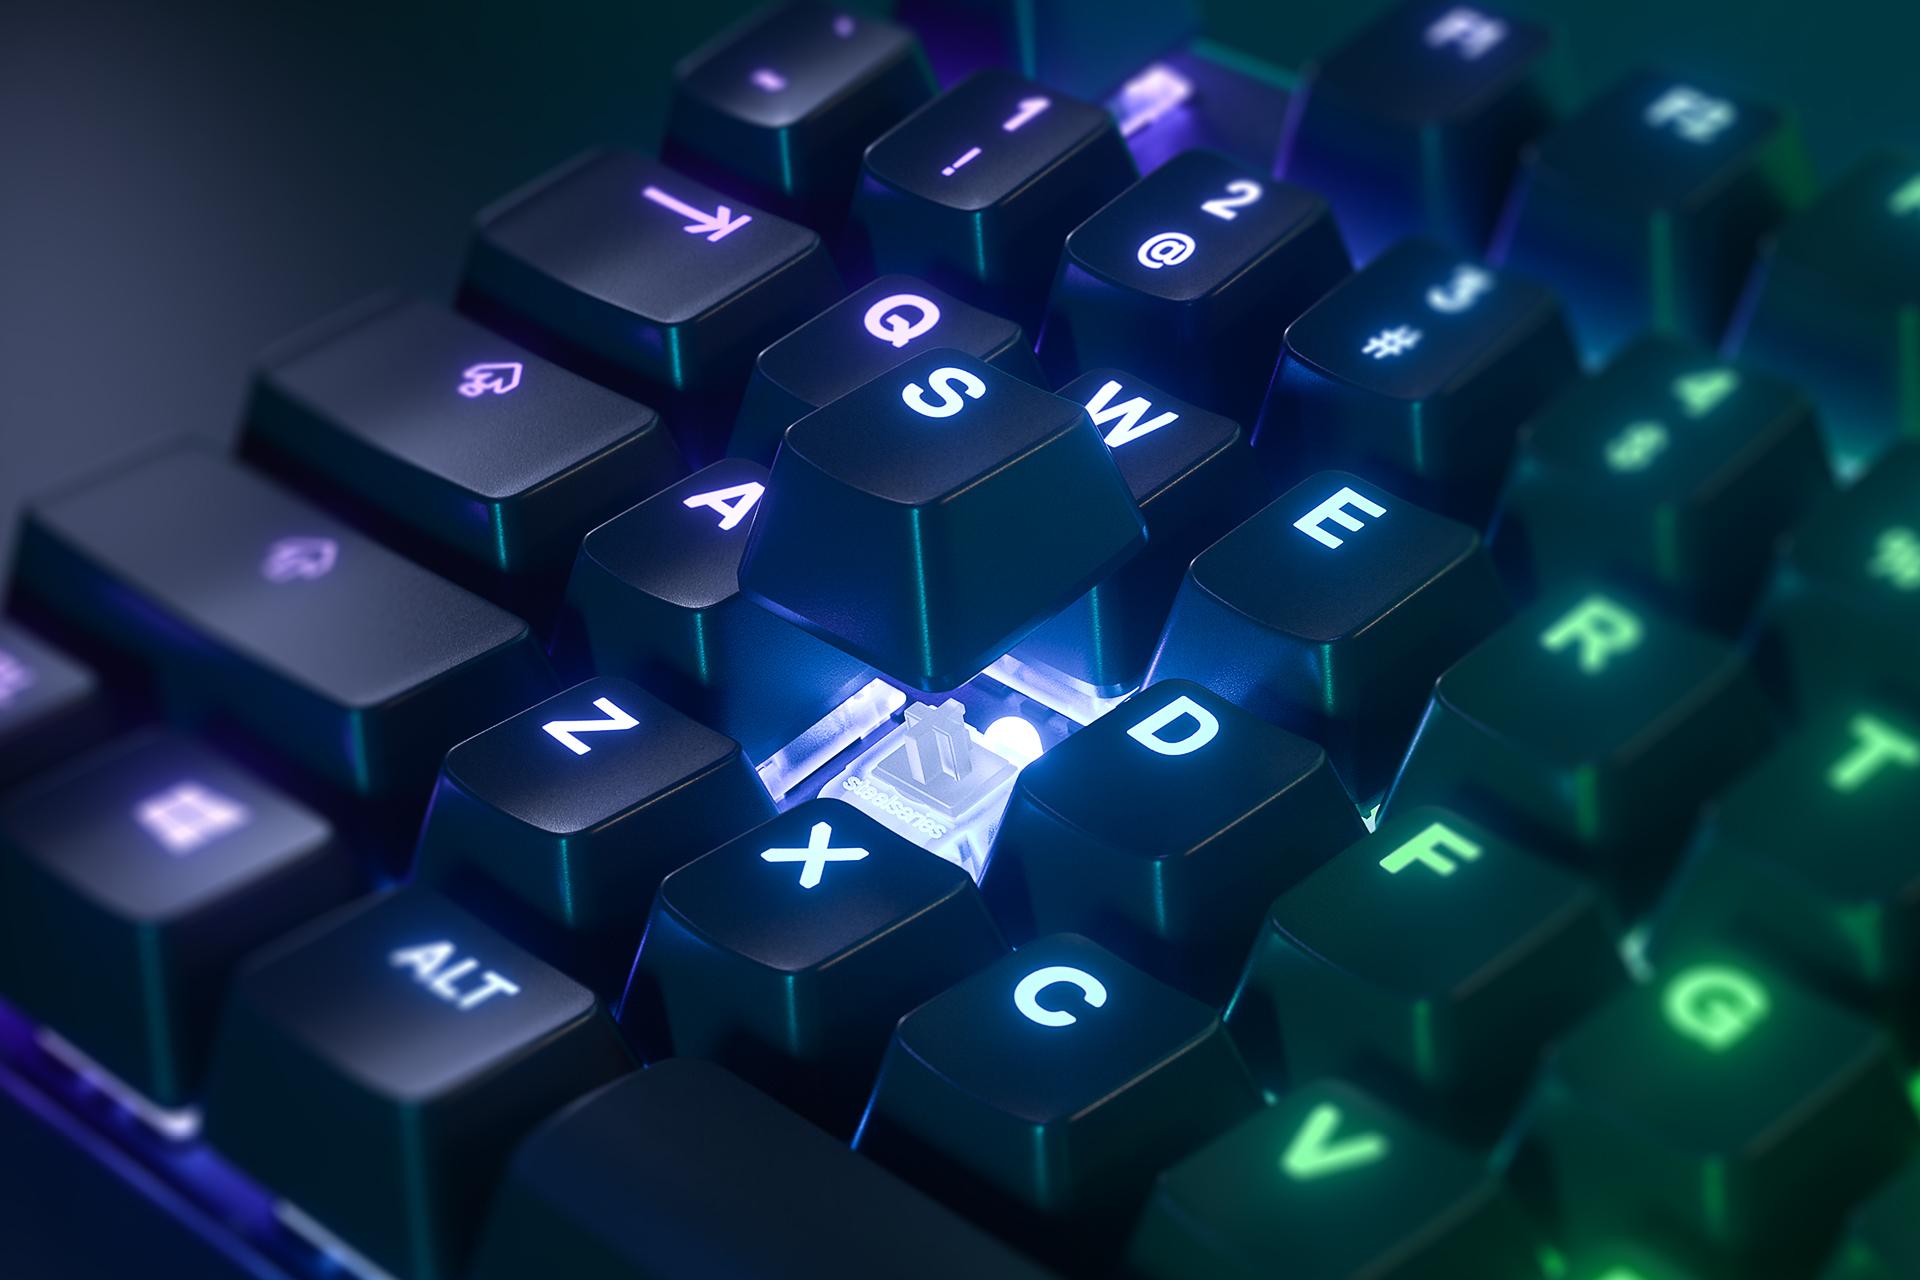 OmniPoint switch minus keycap